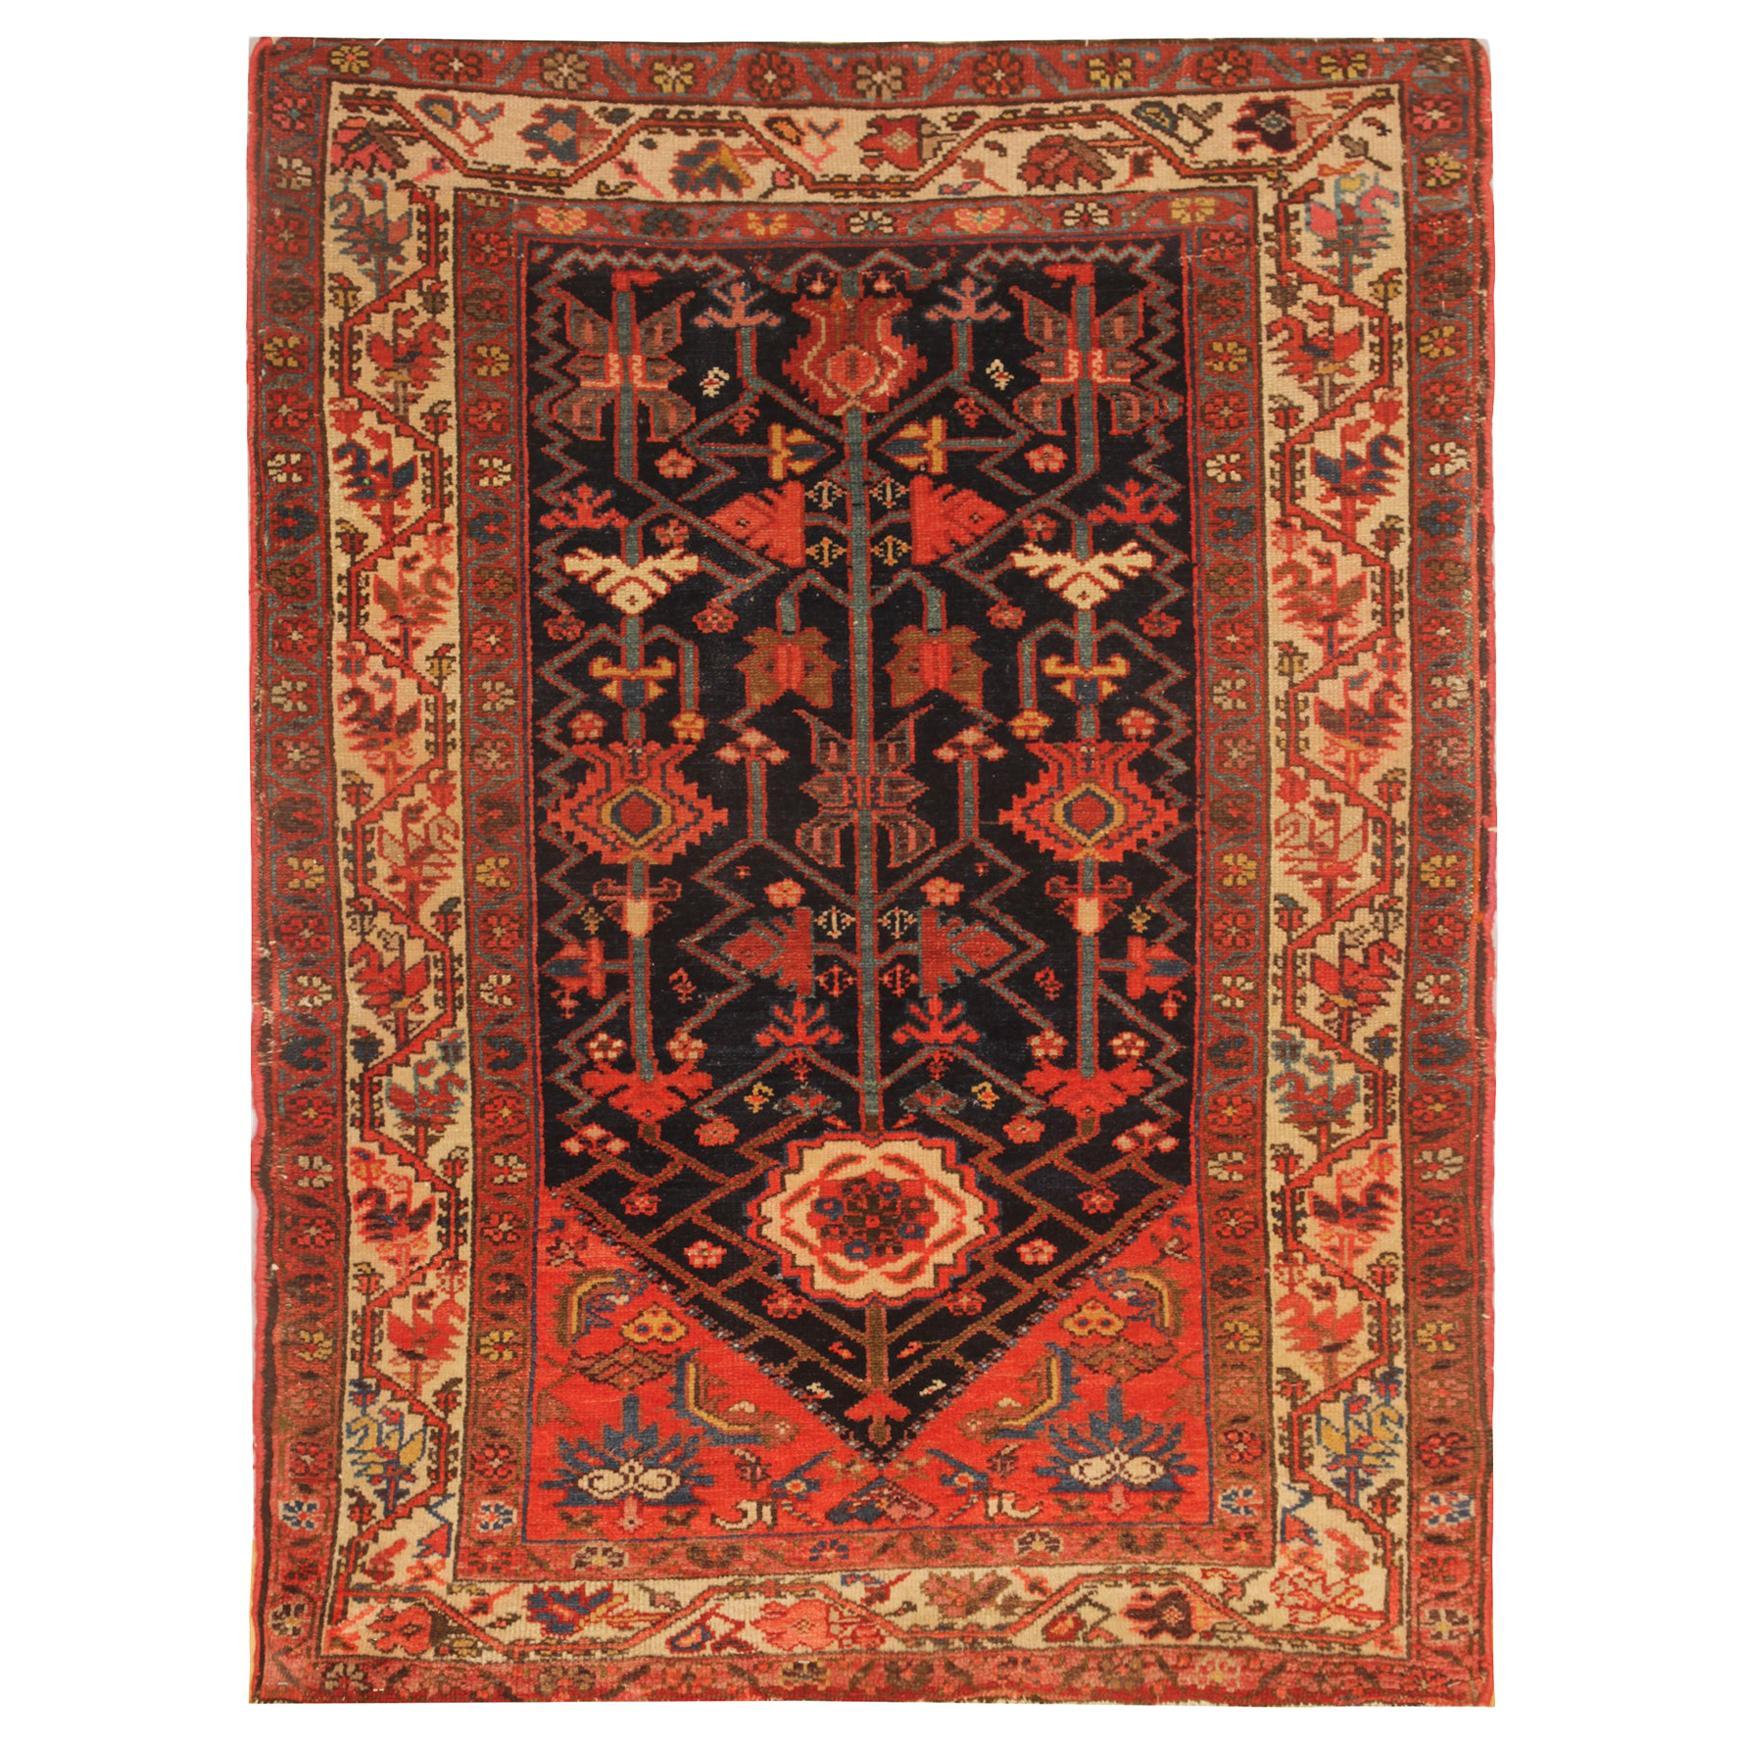 Rare Antique Rug Caucasian Oriental Rug Handmade Carpet Kazak Area Rug for Sale